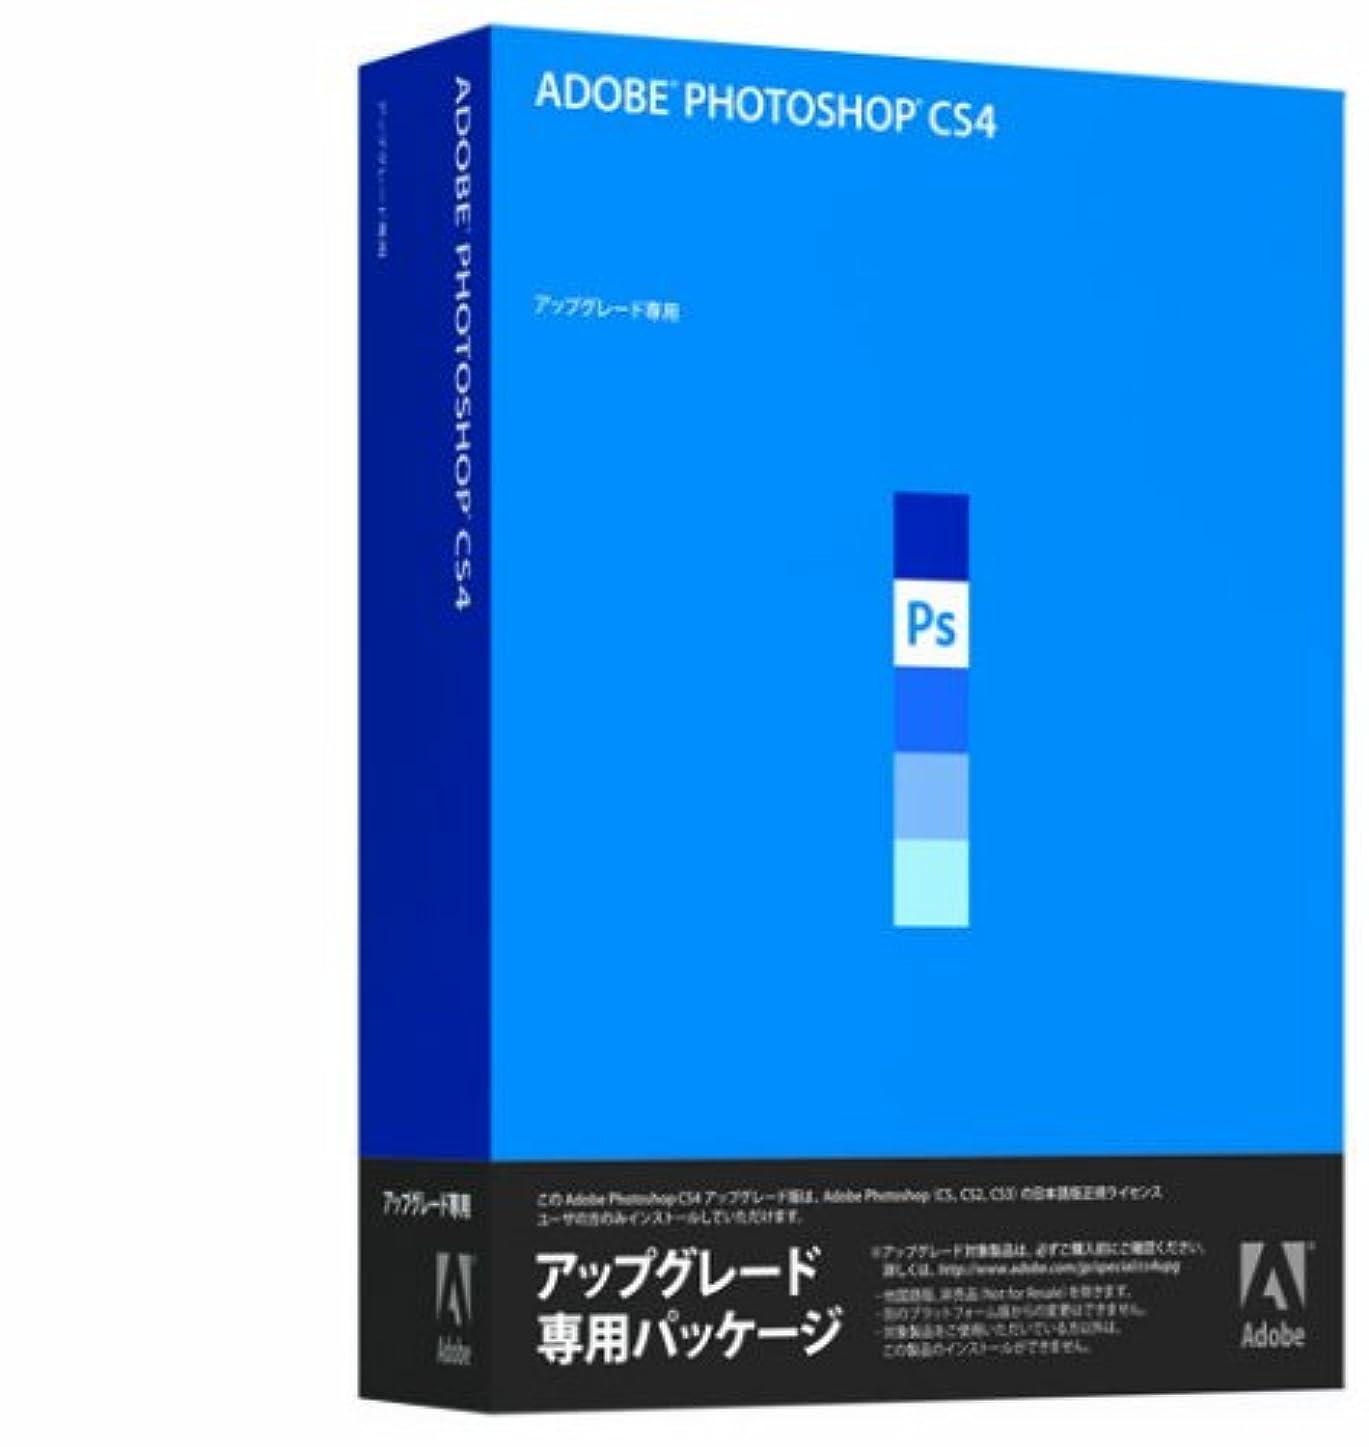 Adobe Photoshop CS4 (V11.0) 日本語版 アップグレード版 Windows版 (旧製品)